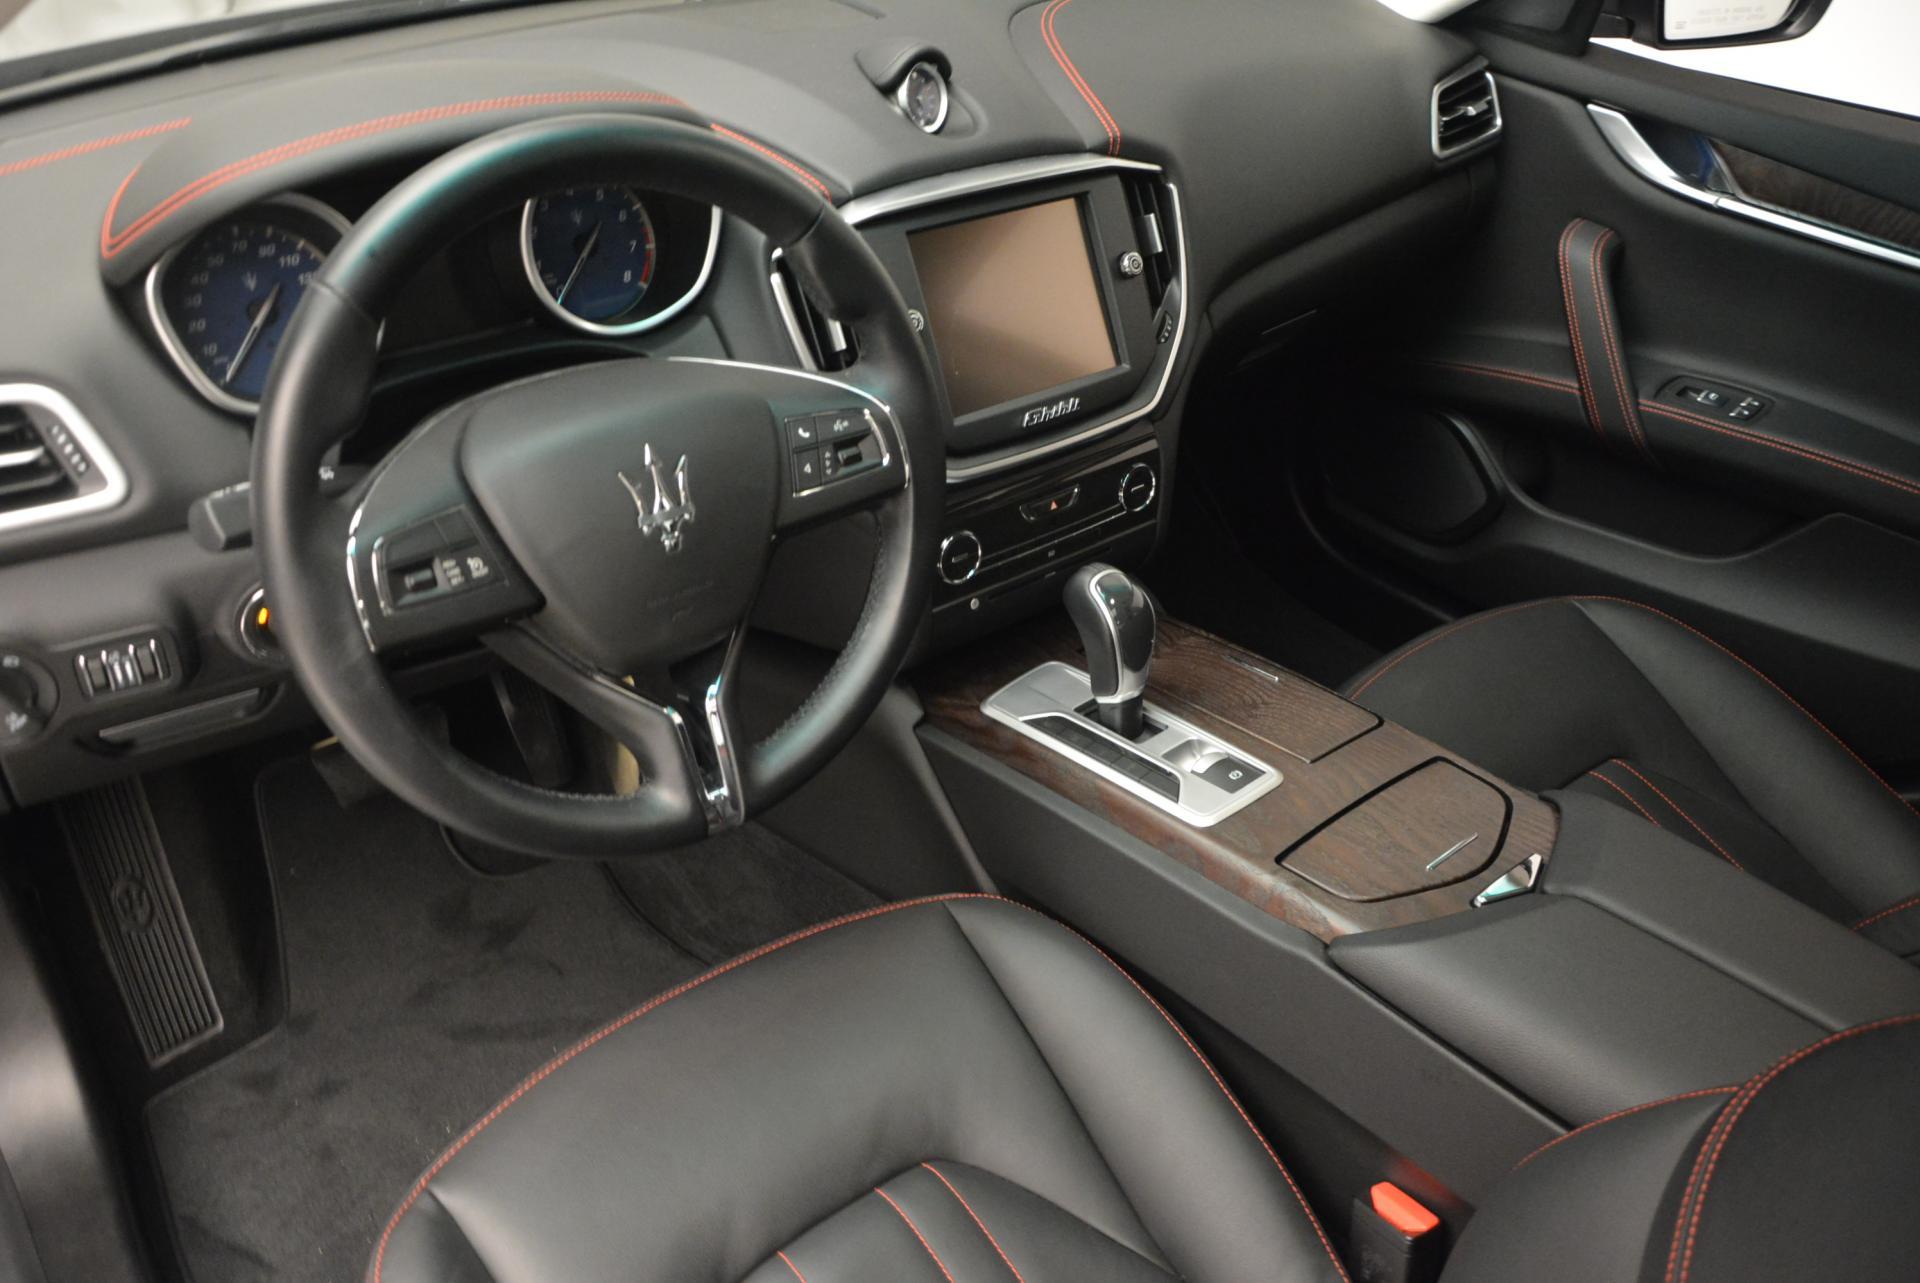 Used 2016 Maserati Ghibli S Q4 For Sale In Westport, CT 192_p22